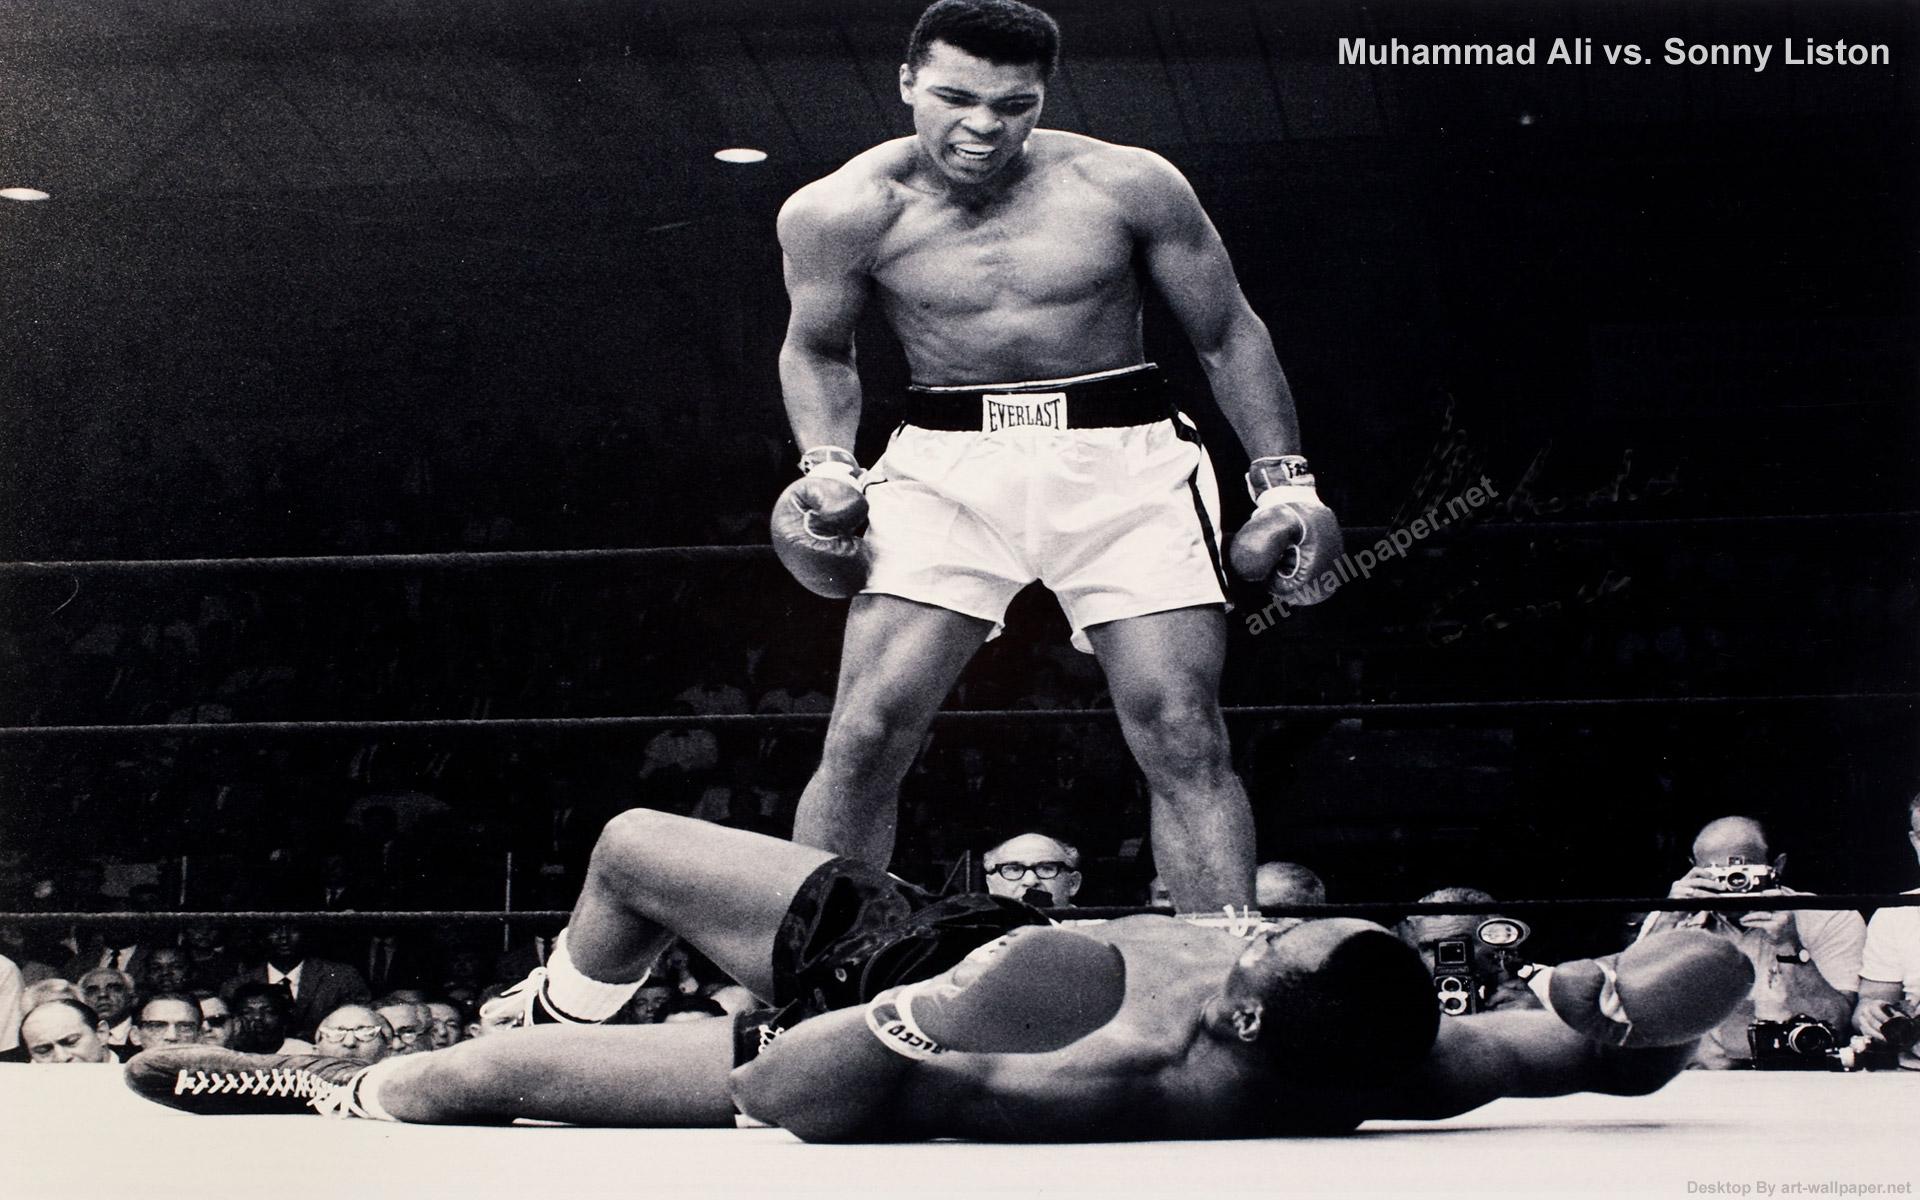 Muhammad Ali Wallpaper Full HD Widescreen 1080p Wallpapers 1920x1200